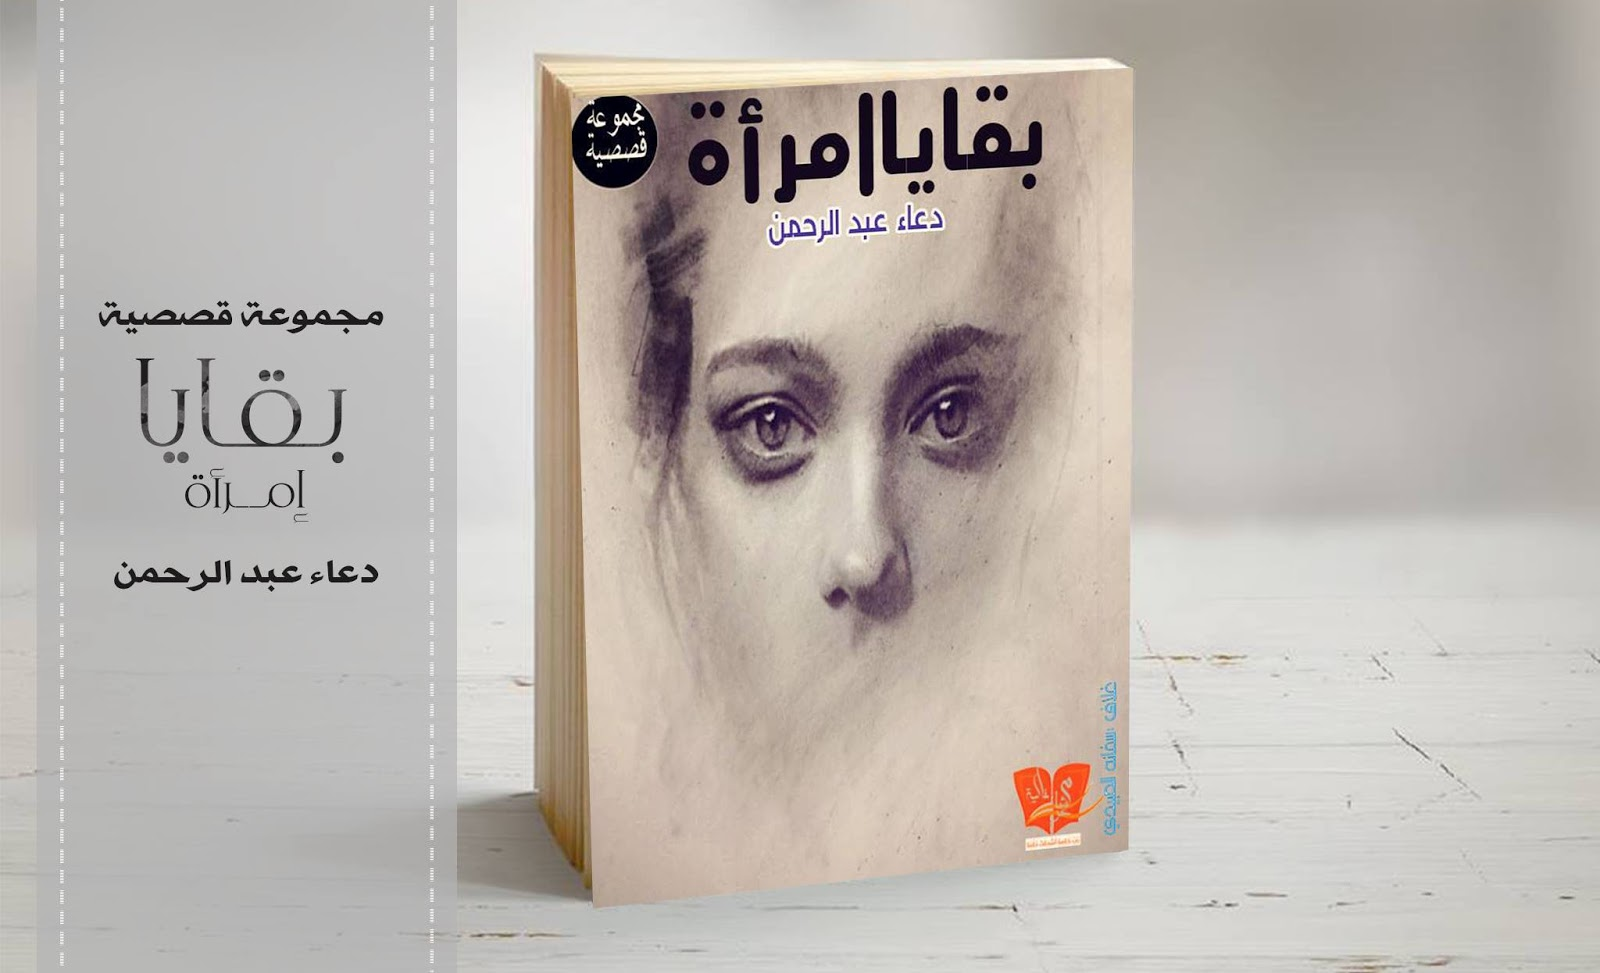 بالصور روايات دعاء عبد الرحمن , اجمل كتب دعاء عبد الرحمن 5492